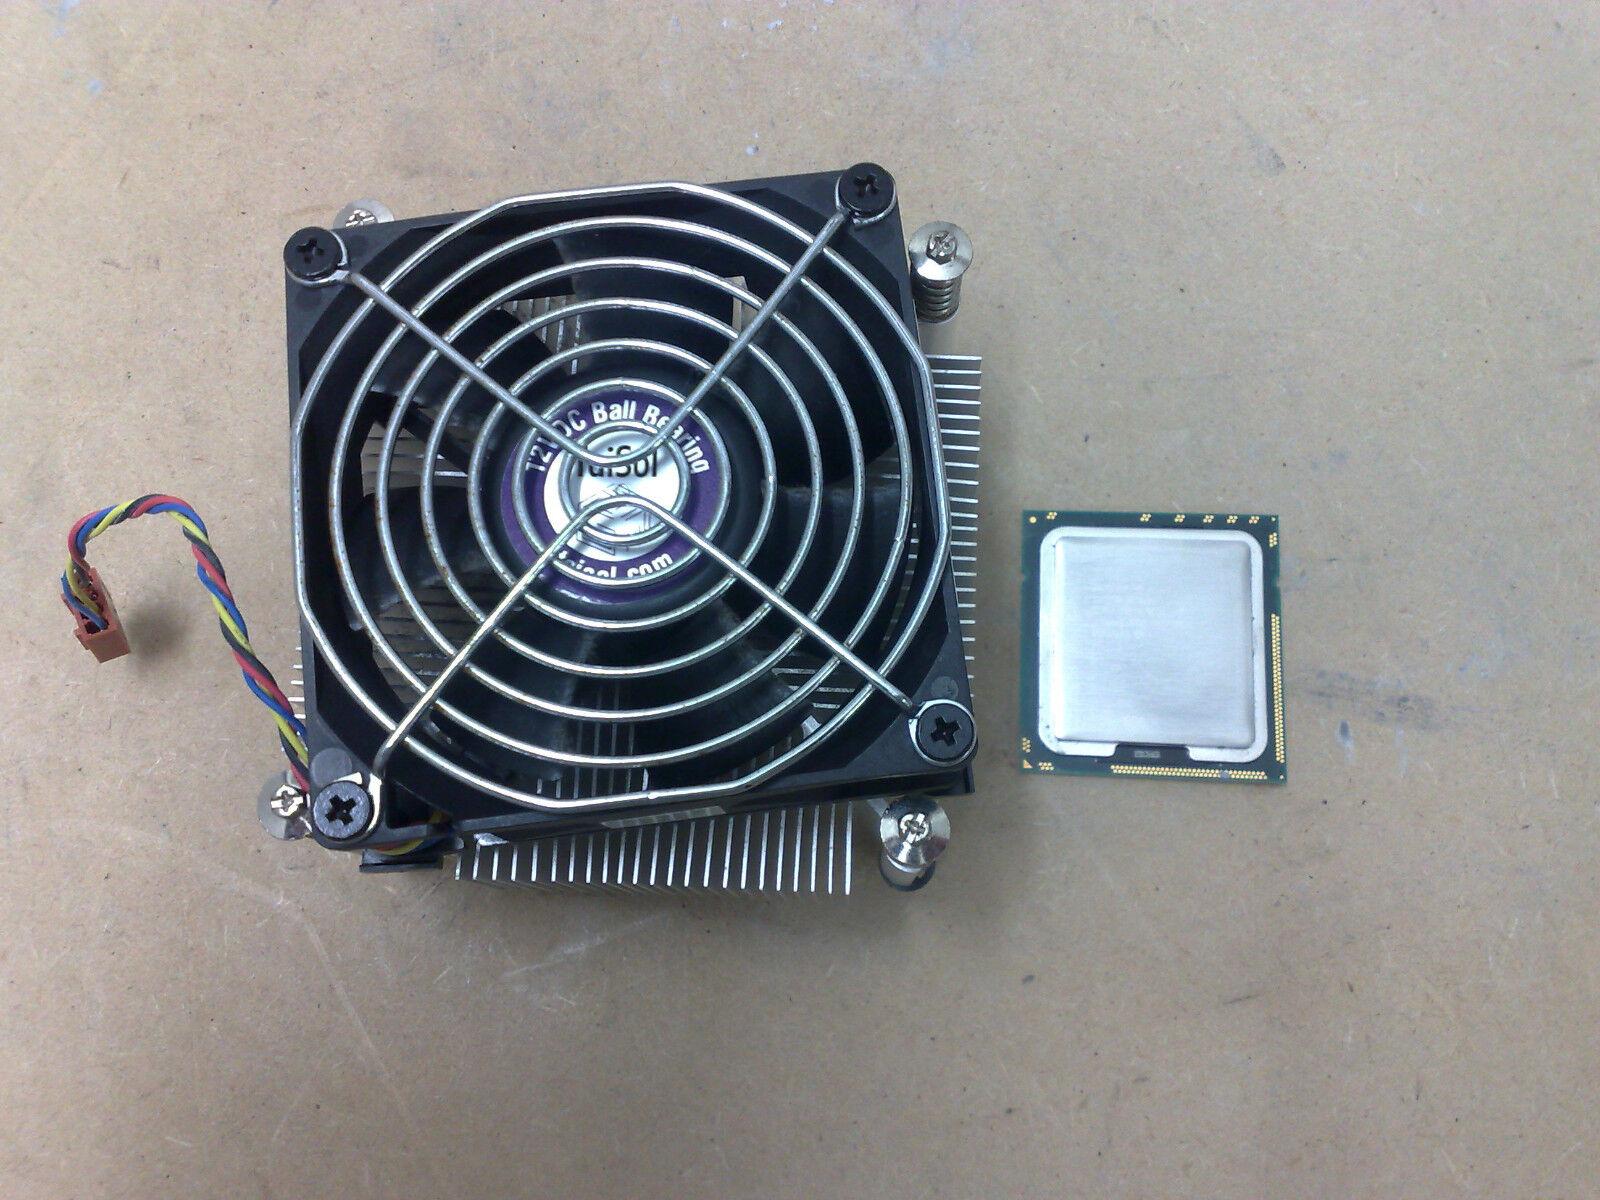 Intel CPU e5520 Xeon 2.26ghz